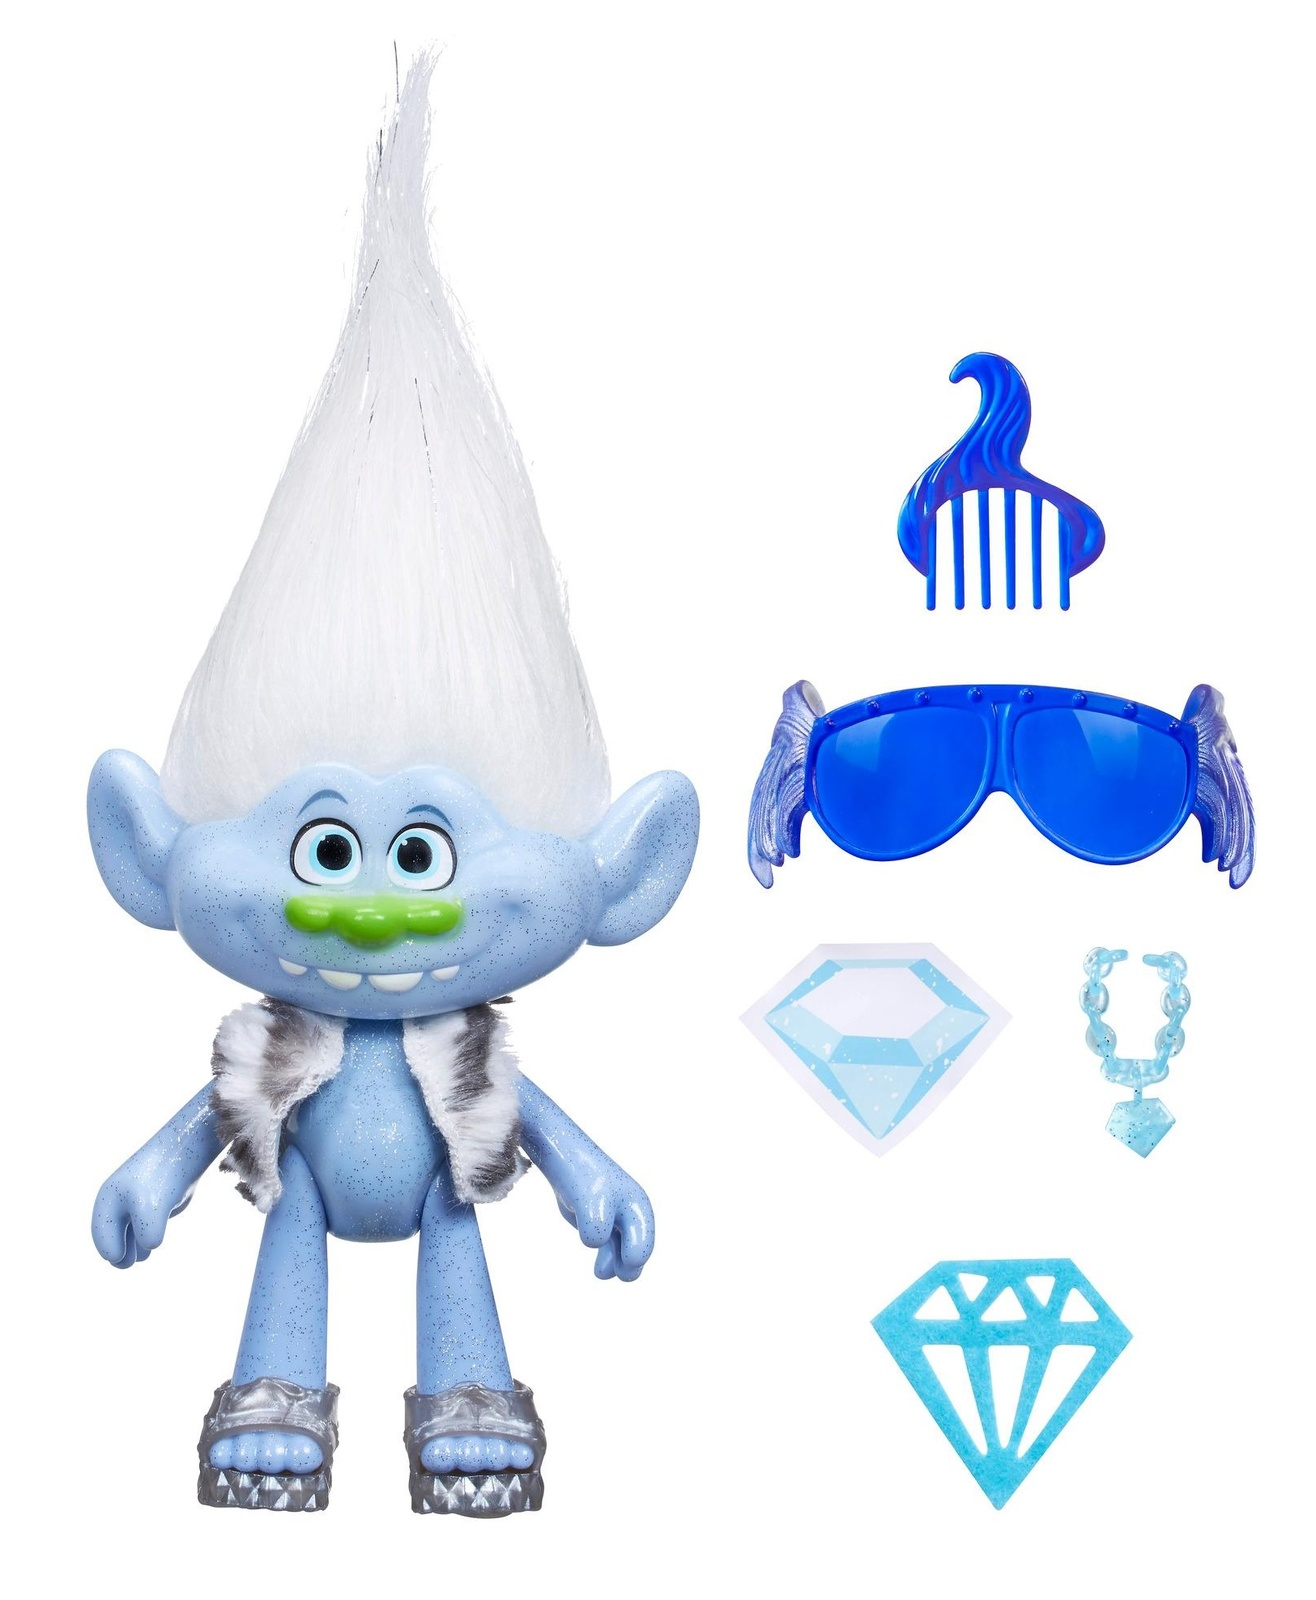 "DreamWorks Trolls: Guy Diamond - 9"" Doll image"